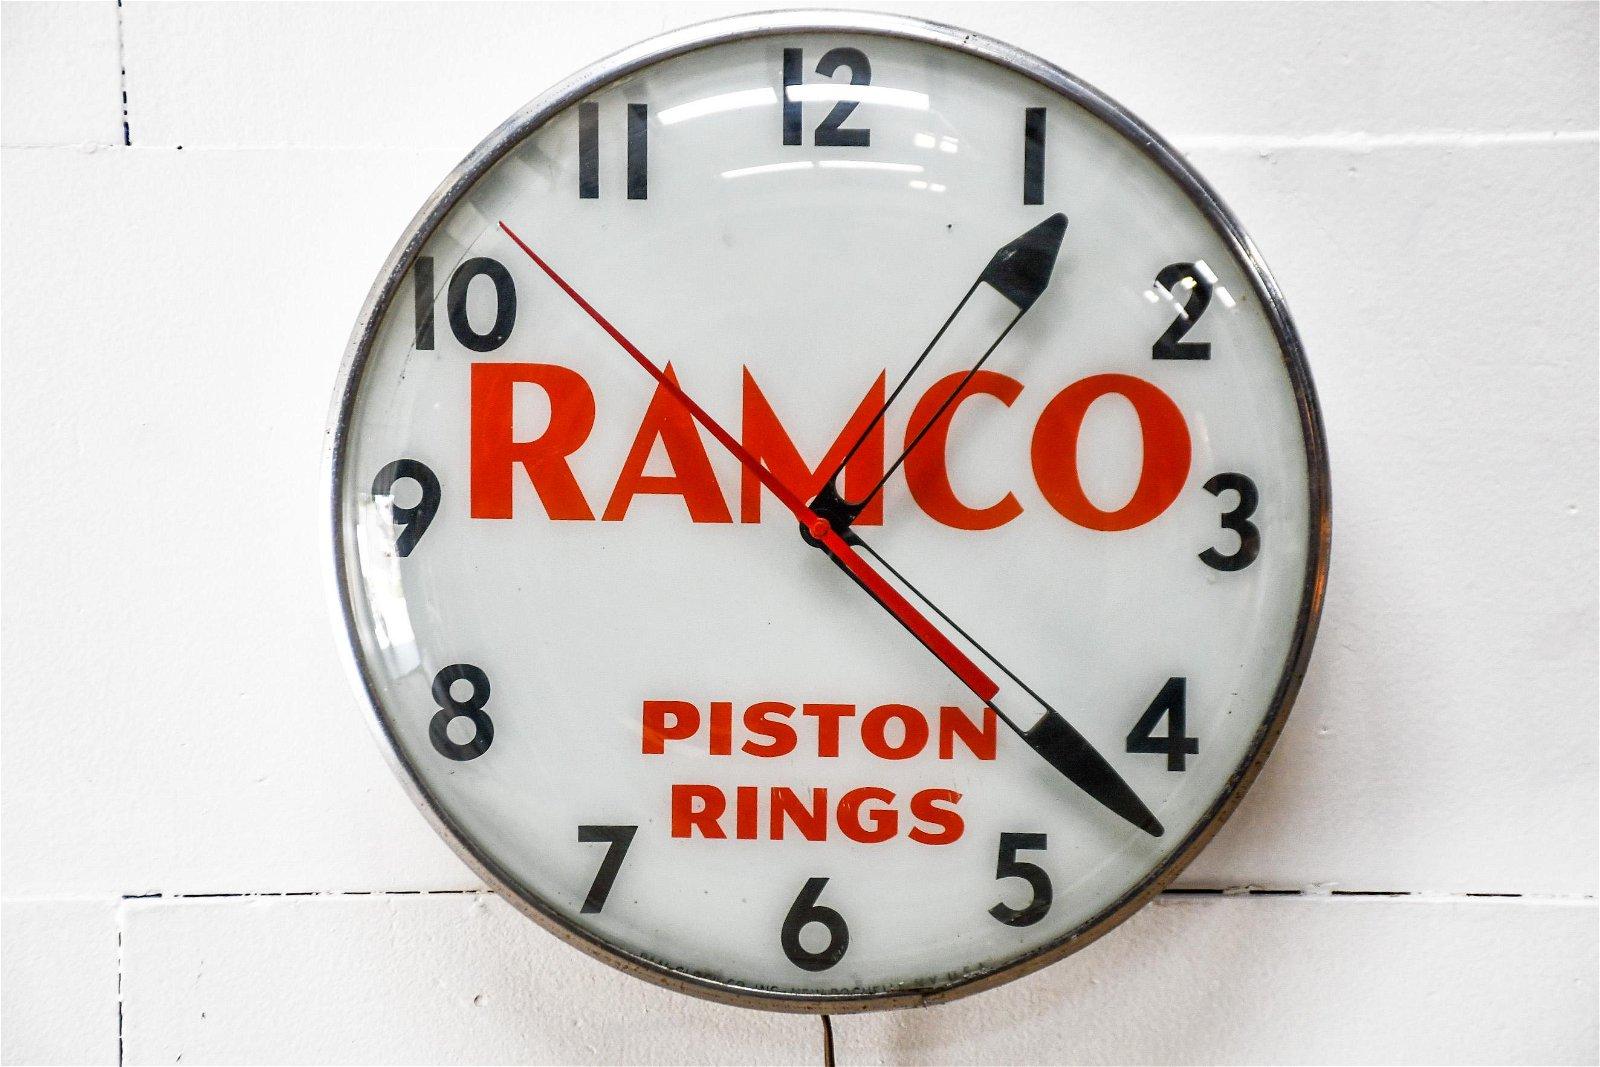 "Ramco Piston Rings Advertising Clock - works 15"" diam."